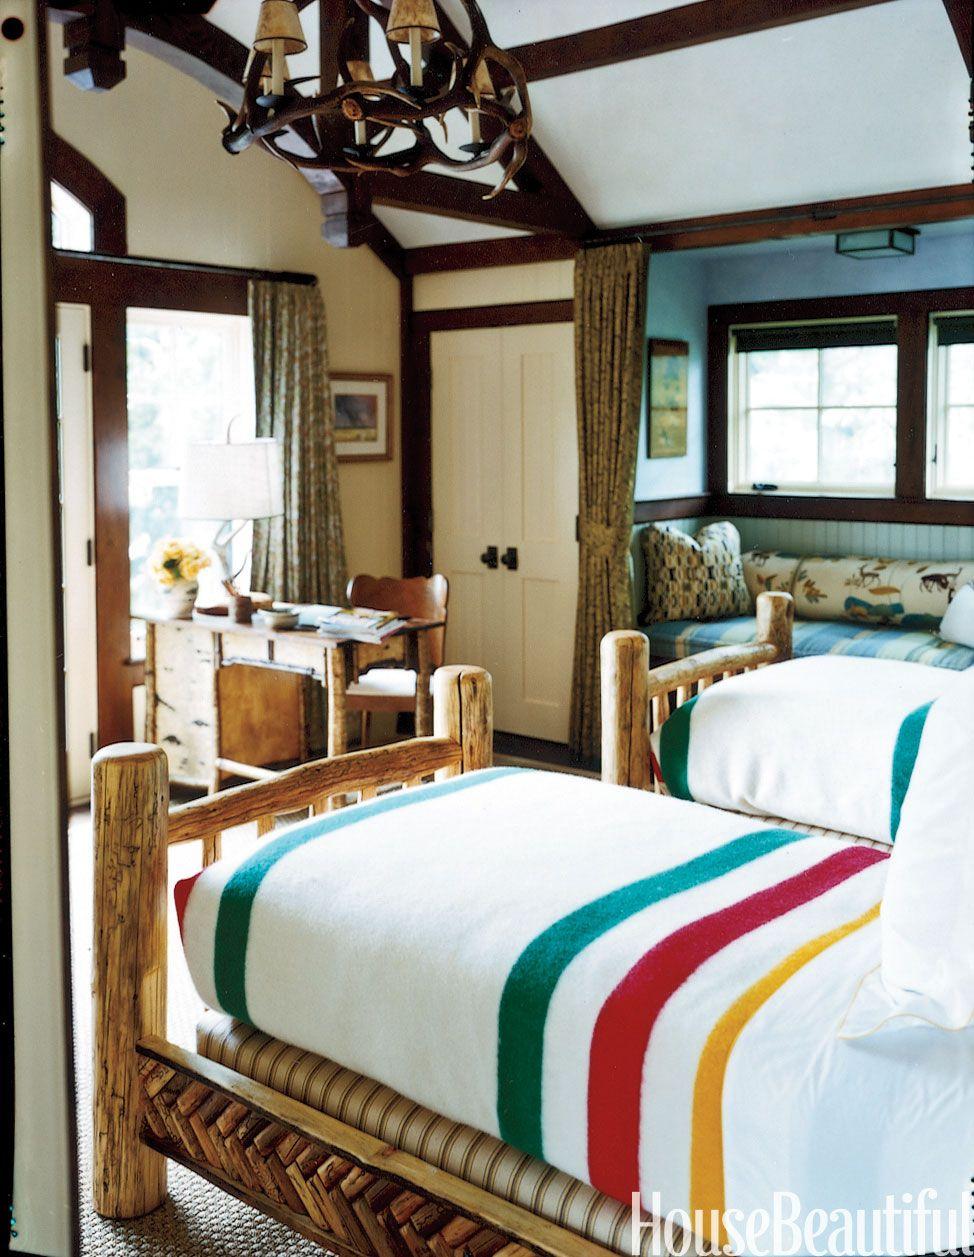 . 30 Cozy Bedroom Ideas   How To Make Your Bedroom Feel Cozy